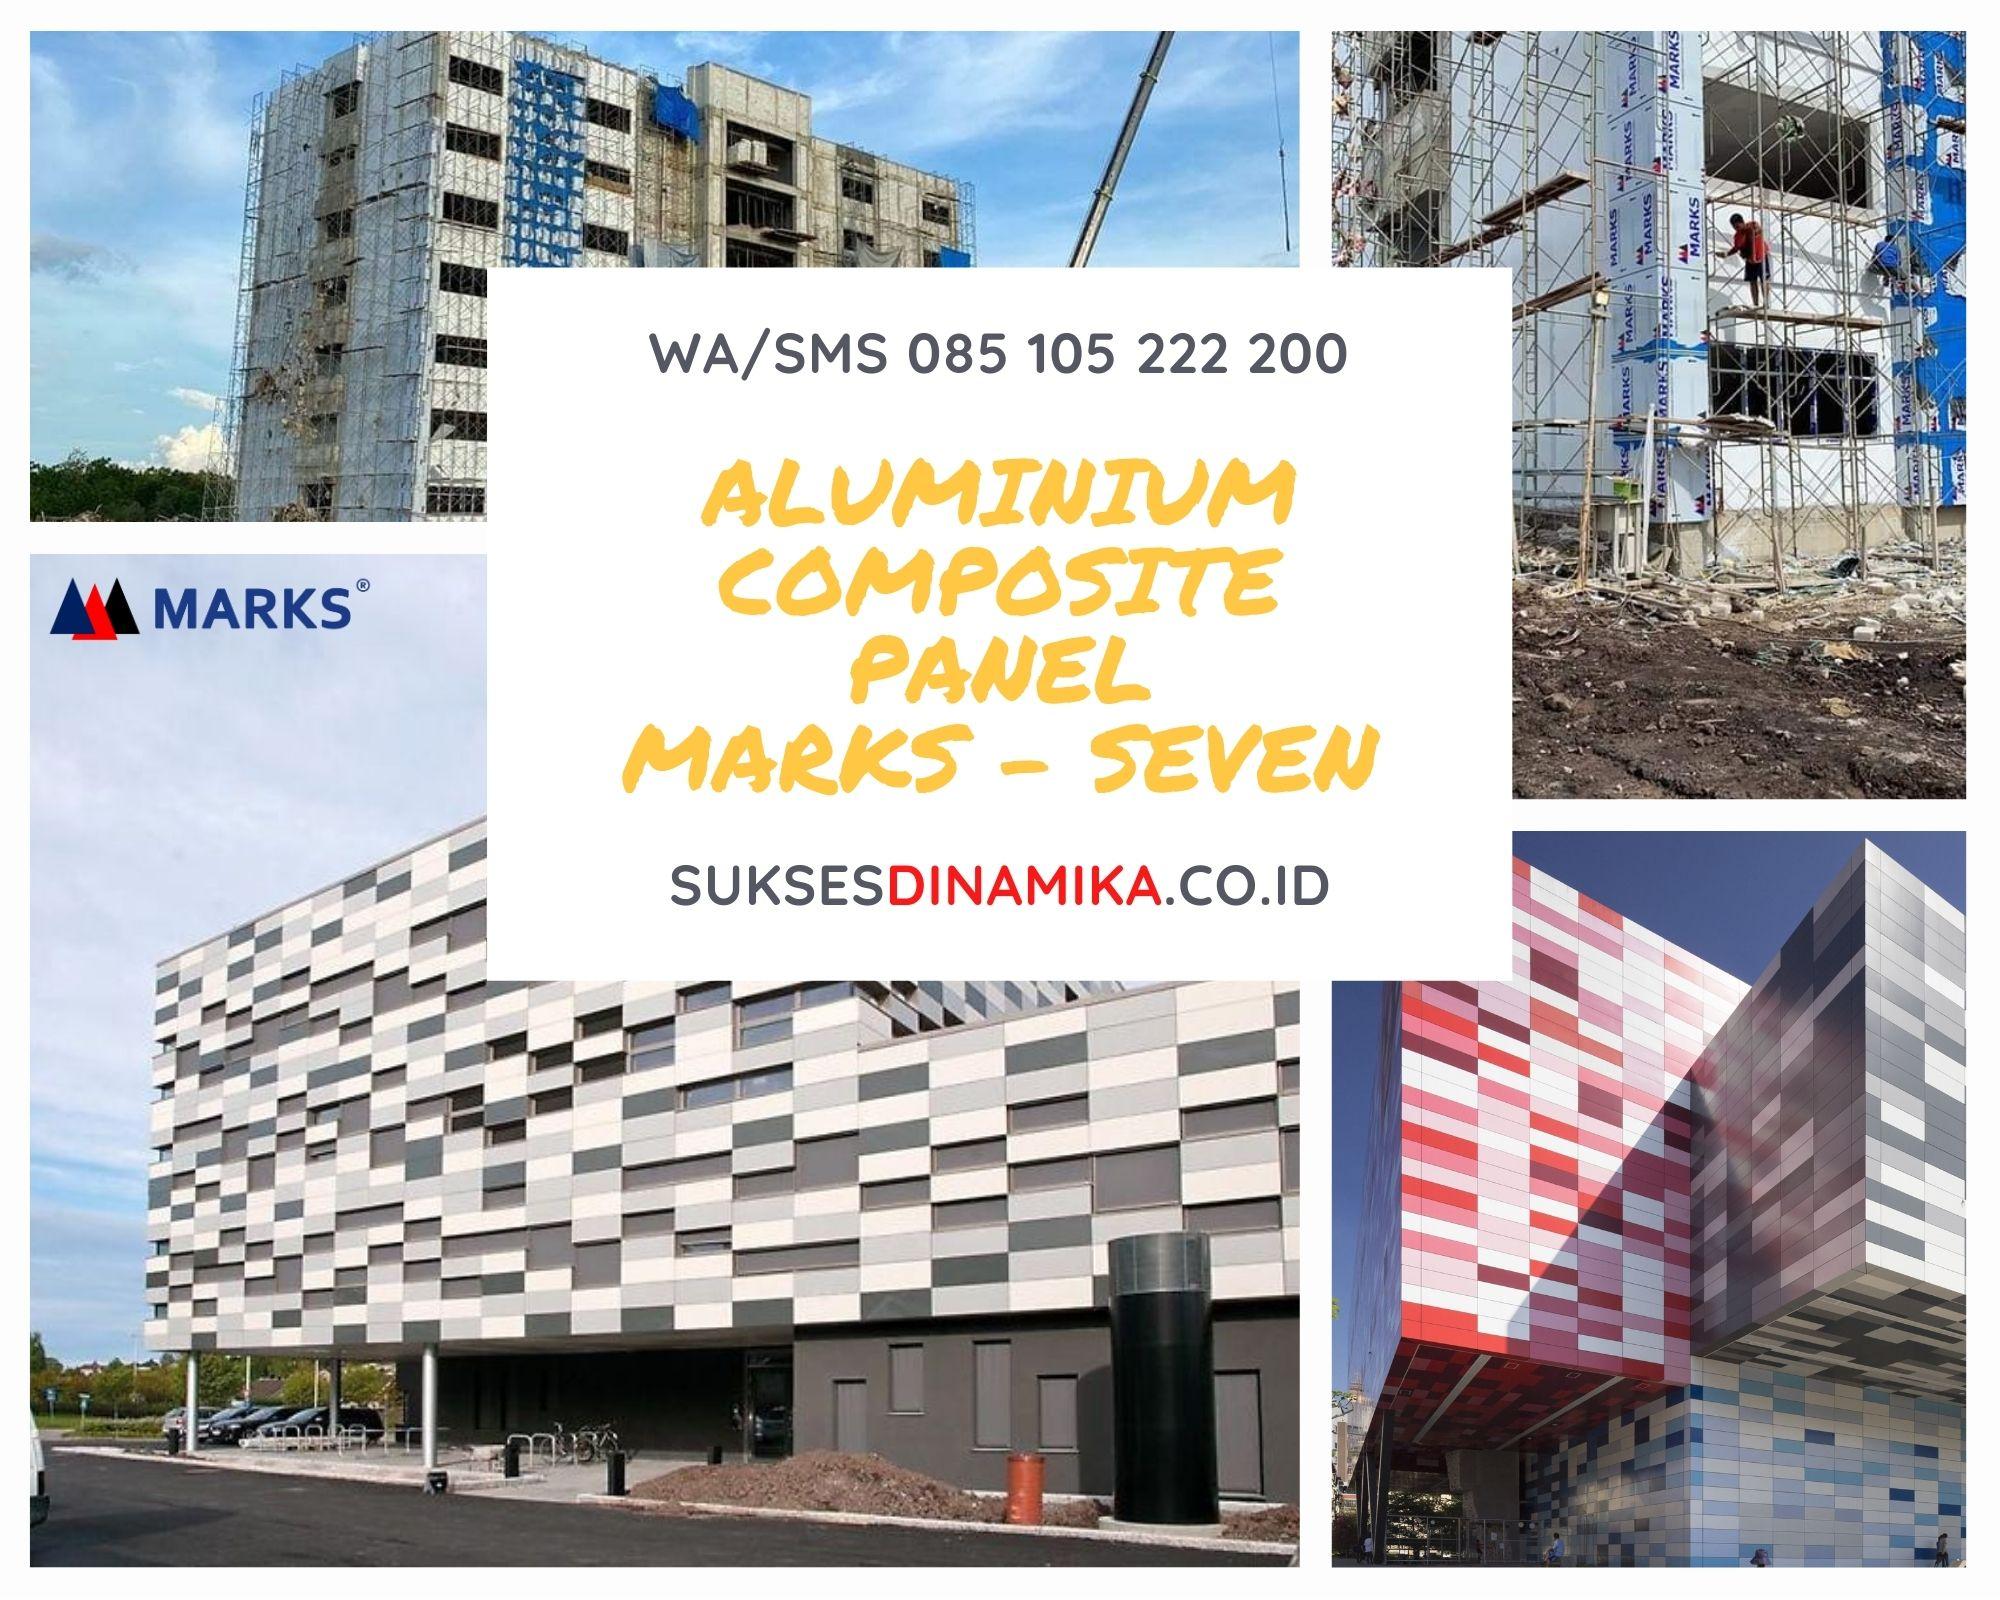 Aplikator ACP Marks Seven Banyuwangi,ACP Marks Seven,Aluminium Composite Panel Marks Seven,Jual ACP Marks Seven,ACP Marks Seven Surabaya,ACP Marks Seven Sidoarjo,ACP Marks Seven Harga,Marks Seven ACP Indonesia,ACP Merk Marks Seven,Katalog ACP Marks Seven,Warna ACP Marks Seven,Harga ACP Marks Seven,Harga ACP Marks Seven Sidoarjo,Harga ACP Merk Marks Seven,ACP Seven Sealant Marks Seven,Sealant ACP Marks Seven,Marks Seven ACP,Katalog ACP Marks Seven Pdf Sidoarjo,Aluminium Composite Panel ACP Marks Seven Indonesia,ACP Marks Seven Aluminium Composite Panel,Aluminium Composite Panel ACP Marks Seven,Spesifikasi Aluminium Composite Panel ACP Marks Seven,Aluminium Composite Panel ACP PE Marks Seven,Jual ACP Marks Seven Malang,Jual ACP Marks Seven Semarang,Marks Seven Katalog ACP,Marks Seven Katalog ACP Pdf,Marks Seven Warna ACP,Harga ACP Marks Seven Malang,Harga ACP Marks Seven 2mm,Harga ACP Marks Seven Semarang,Harga ACP Marks Seven Di Semarang,Harga ACP Merk Jiyu